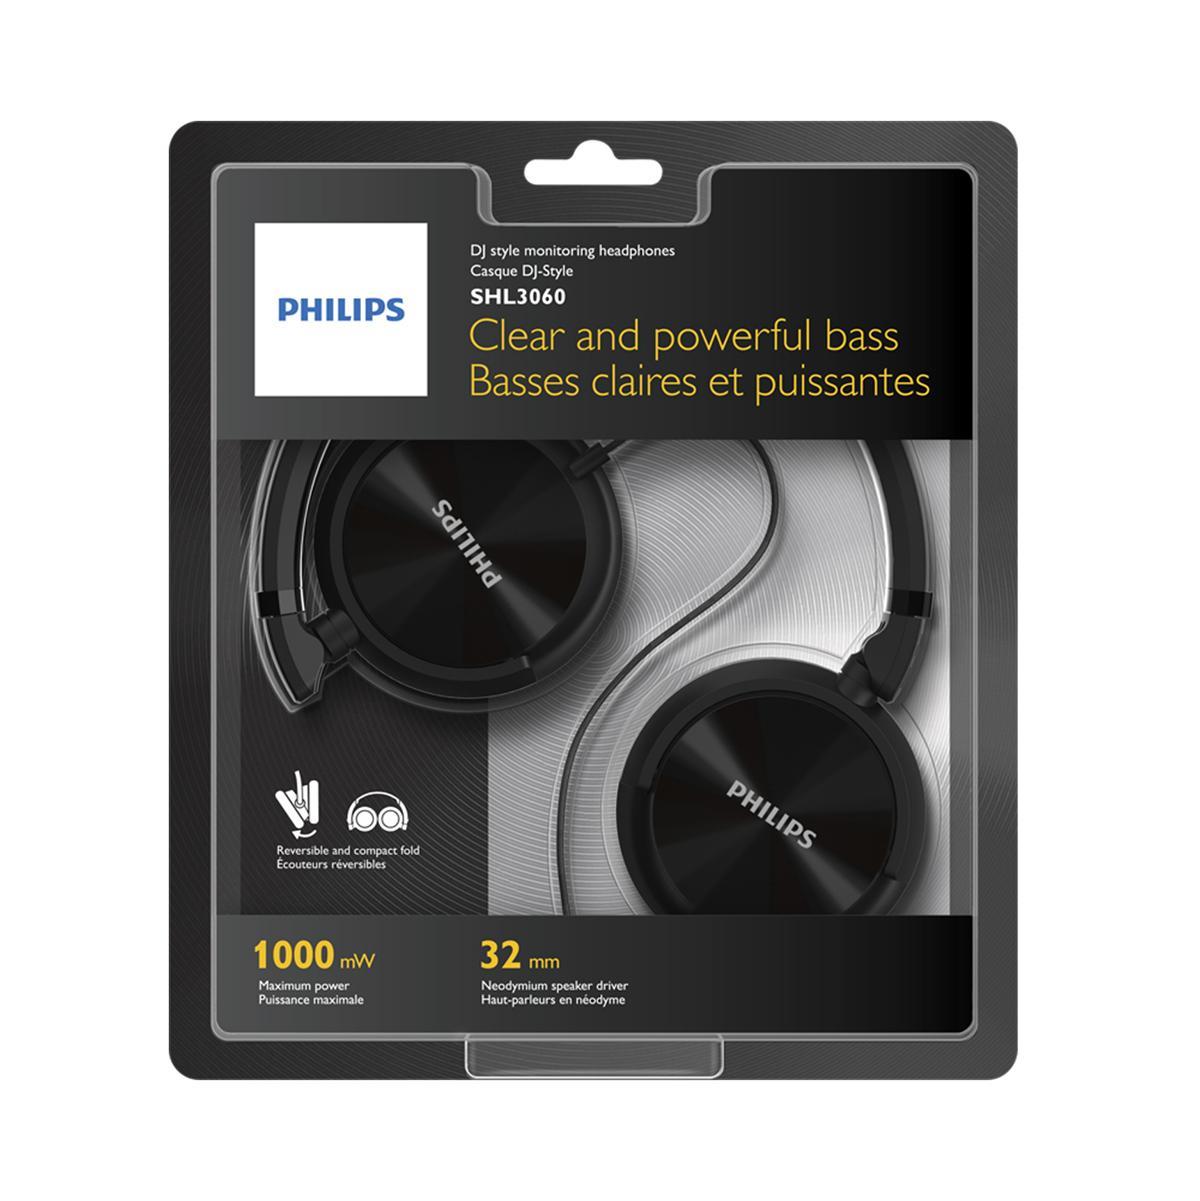 872ae71f713 Amazon.com: Philips SHL3060BK/28 Philips SHL3060BK/28 DJ Style ...